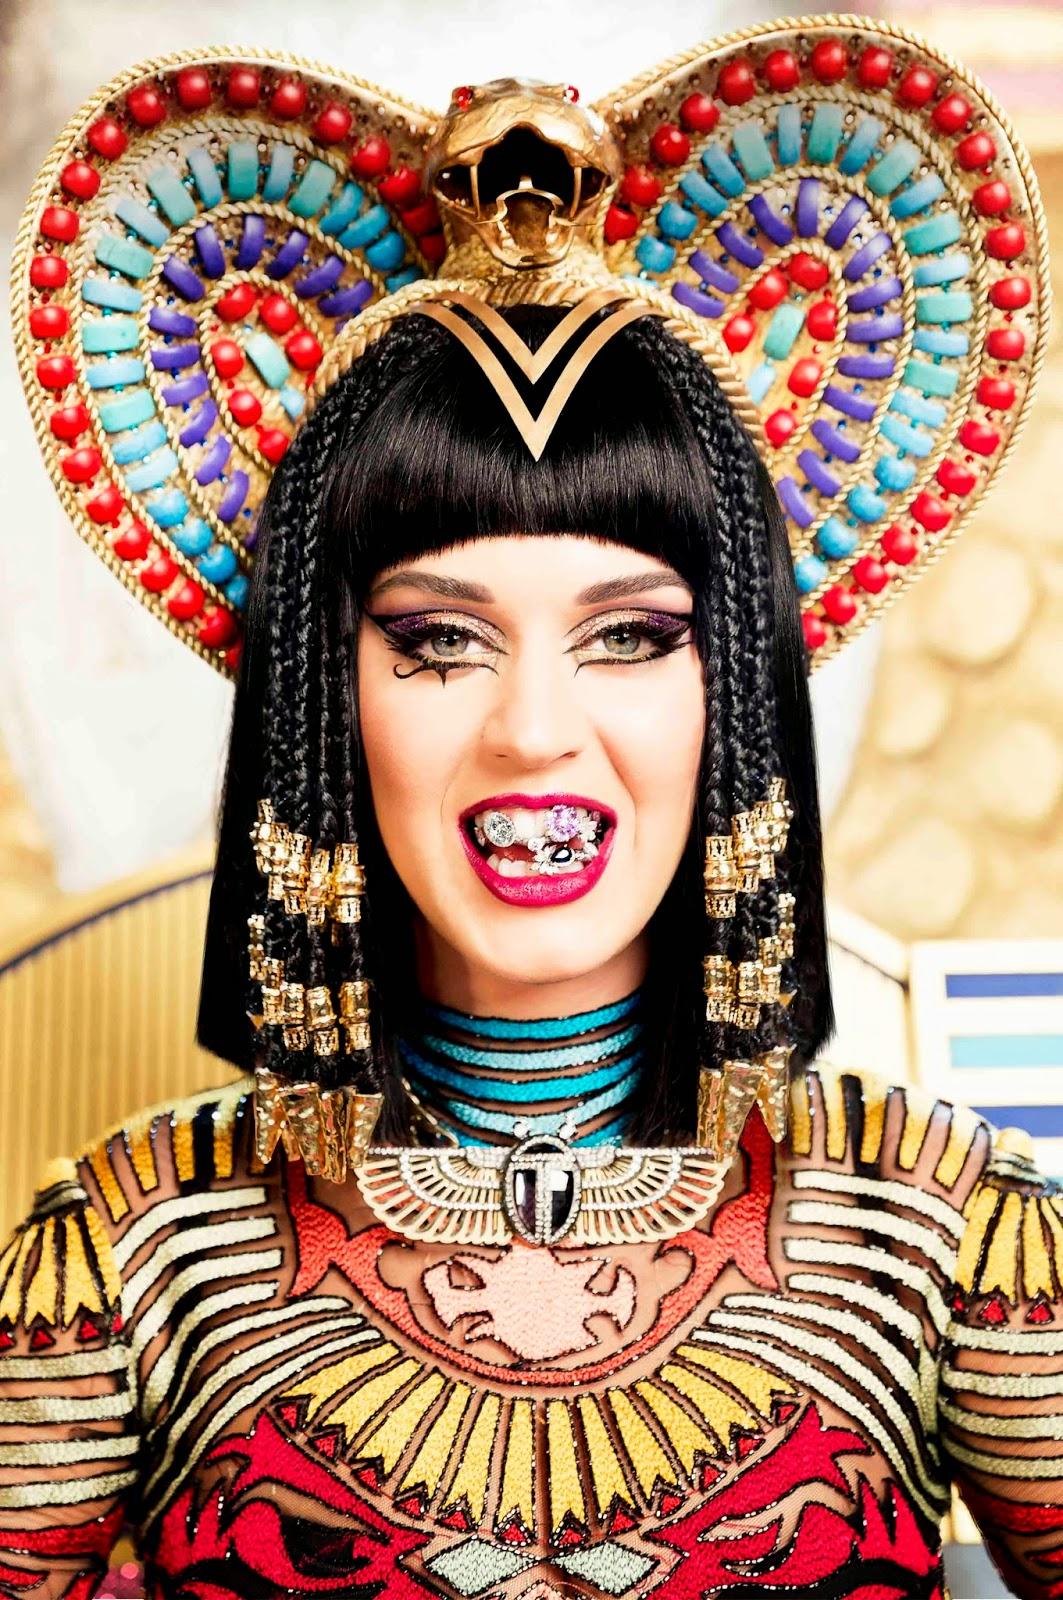 Music Video, Katy Perry, Katy Perry Music Video,  COVERGIRL, COVERGIRL makeup, Bombshell, cleopatra, Egyptian